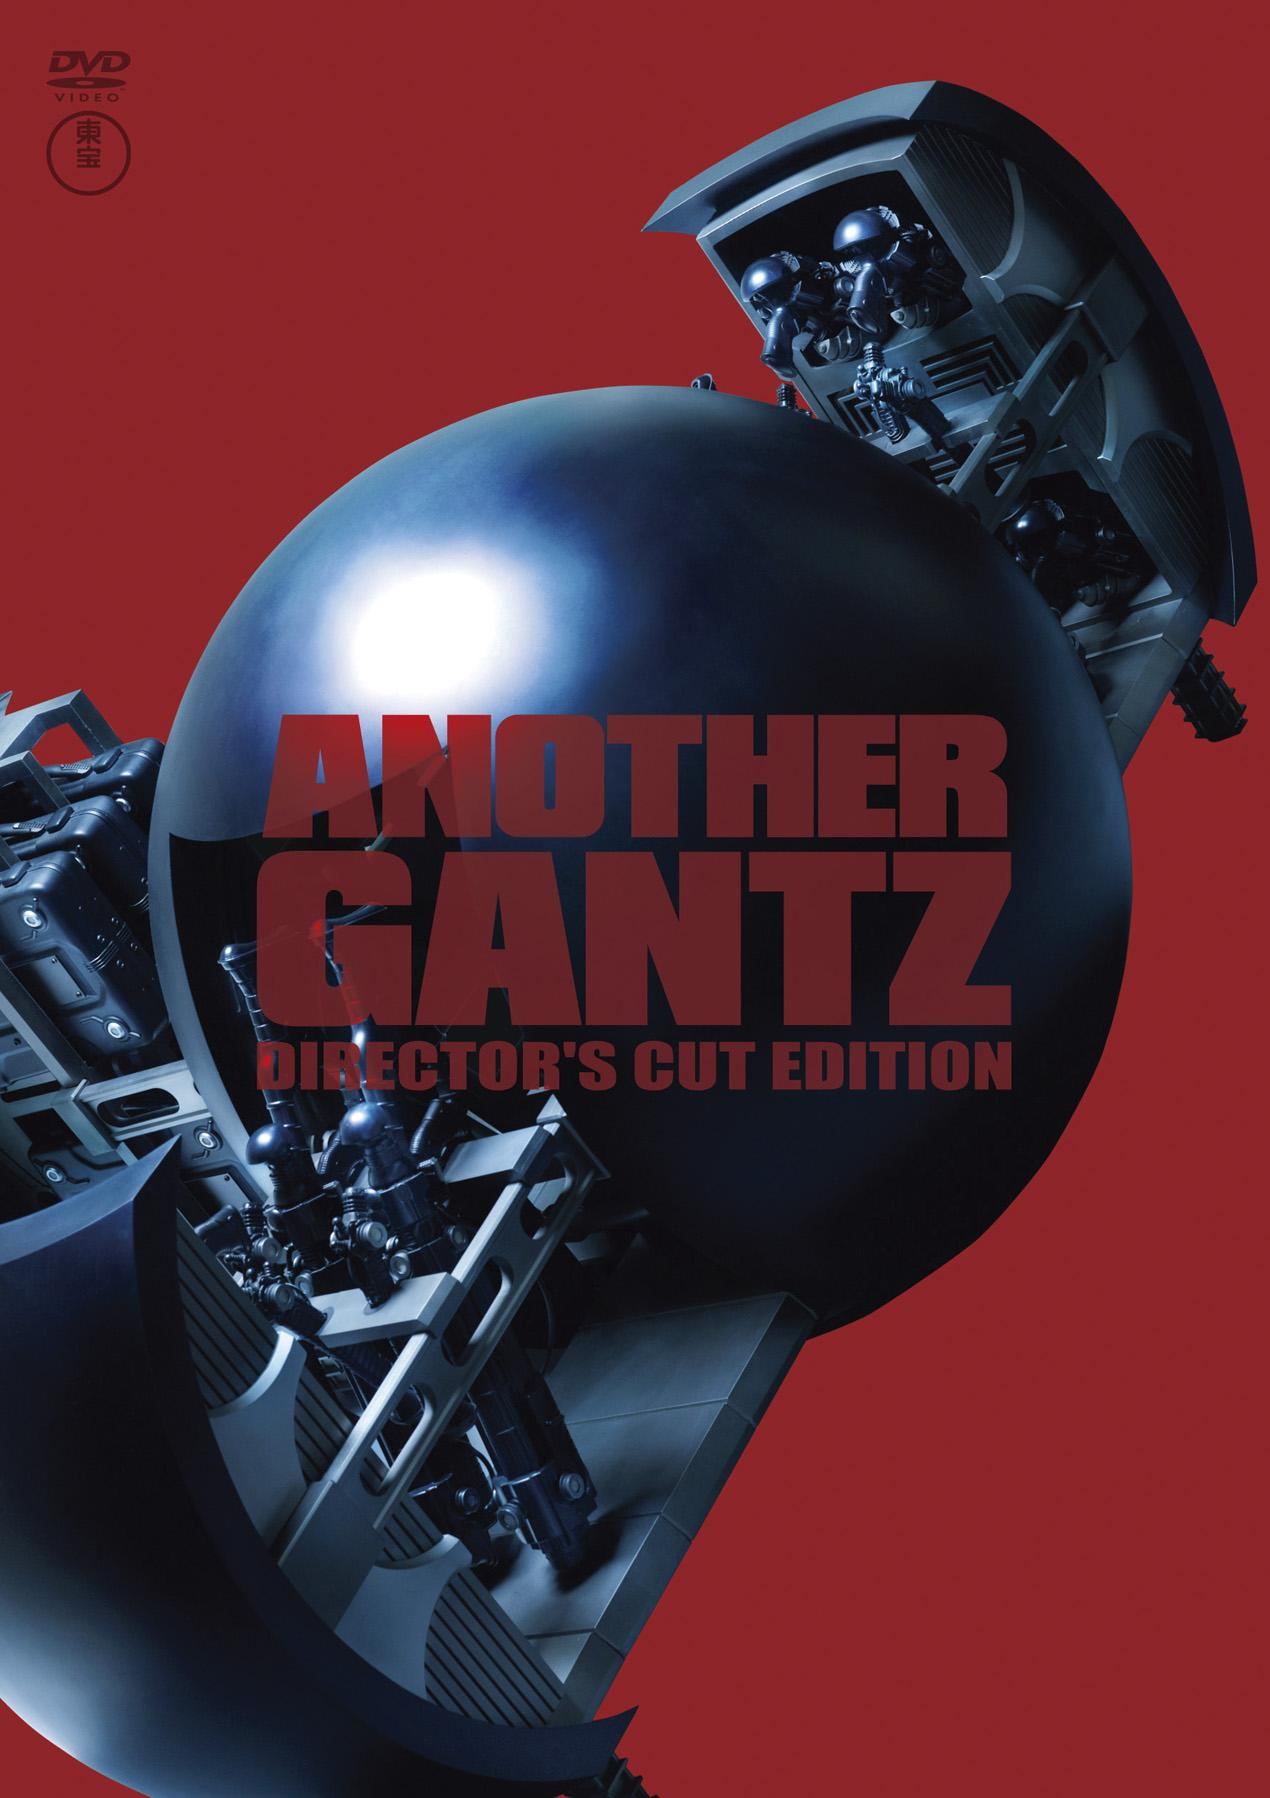 GANTZ : ANOTHER GANTZ ディレクターズカット完全版 のサムネイル画像